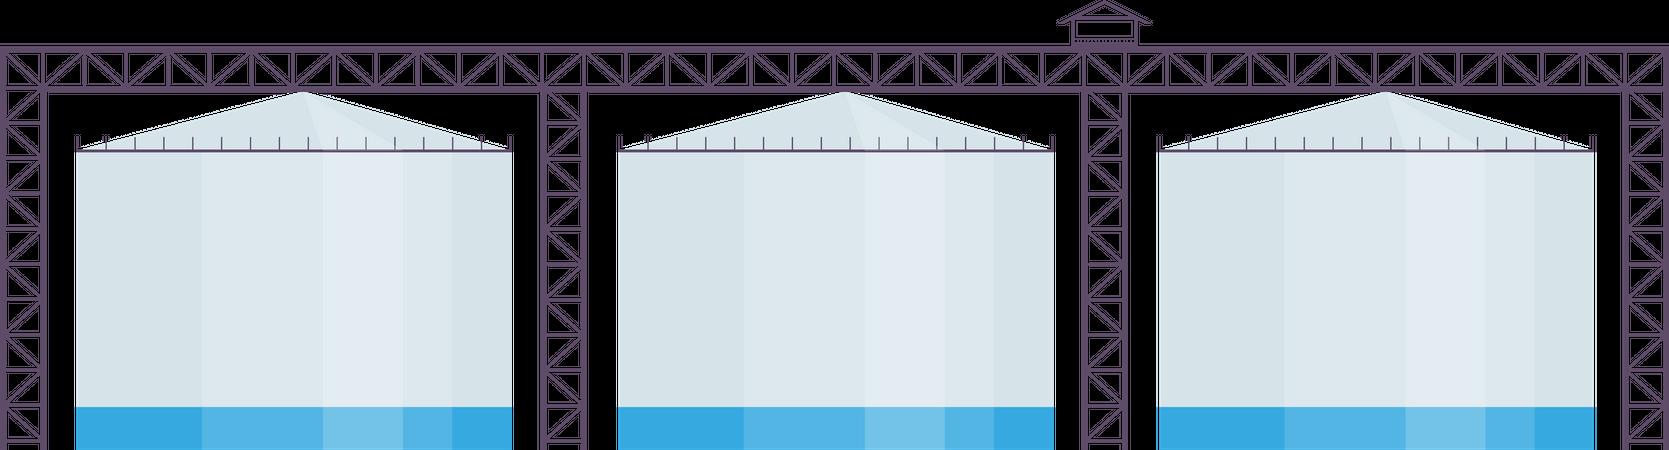 Industrial reservoirs Illustration